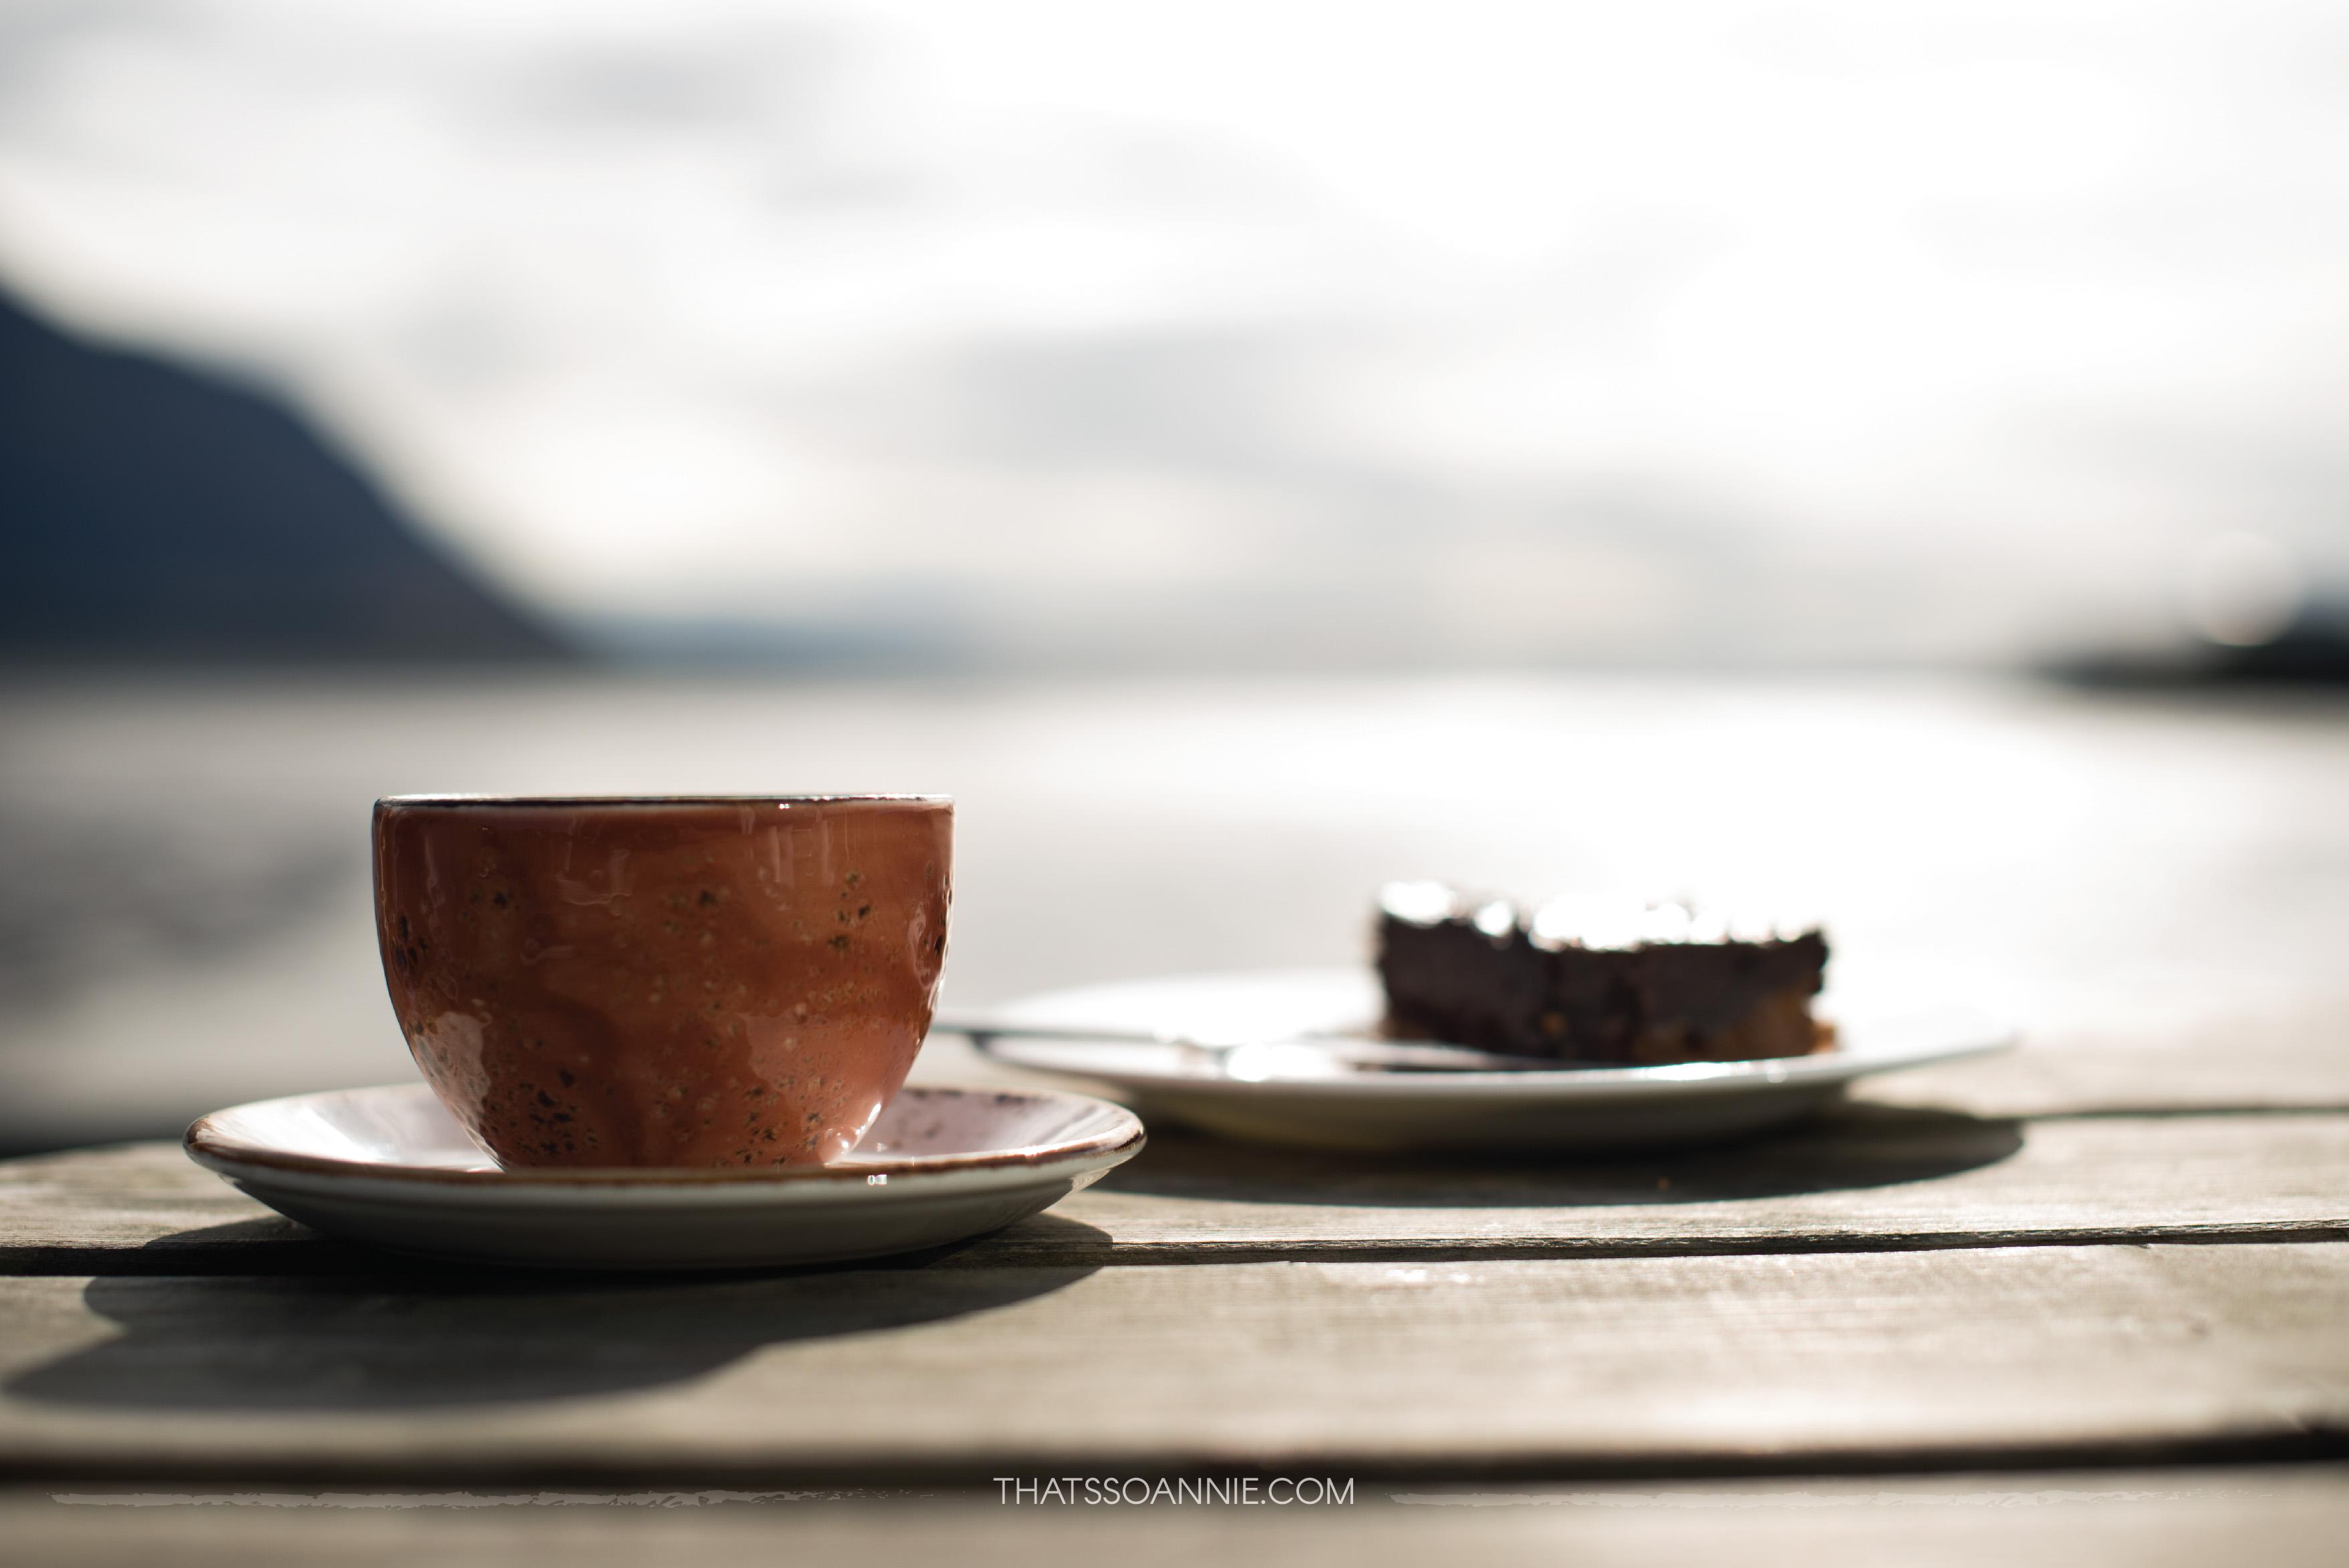 Coffee & Pie @ Geirabakari Kaffihus | Exploring the Snæfellsnes Peninsula, Iceland | www.thatssoannie.com